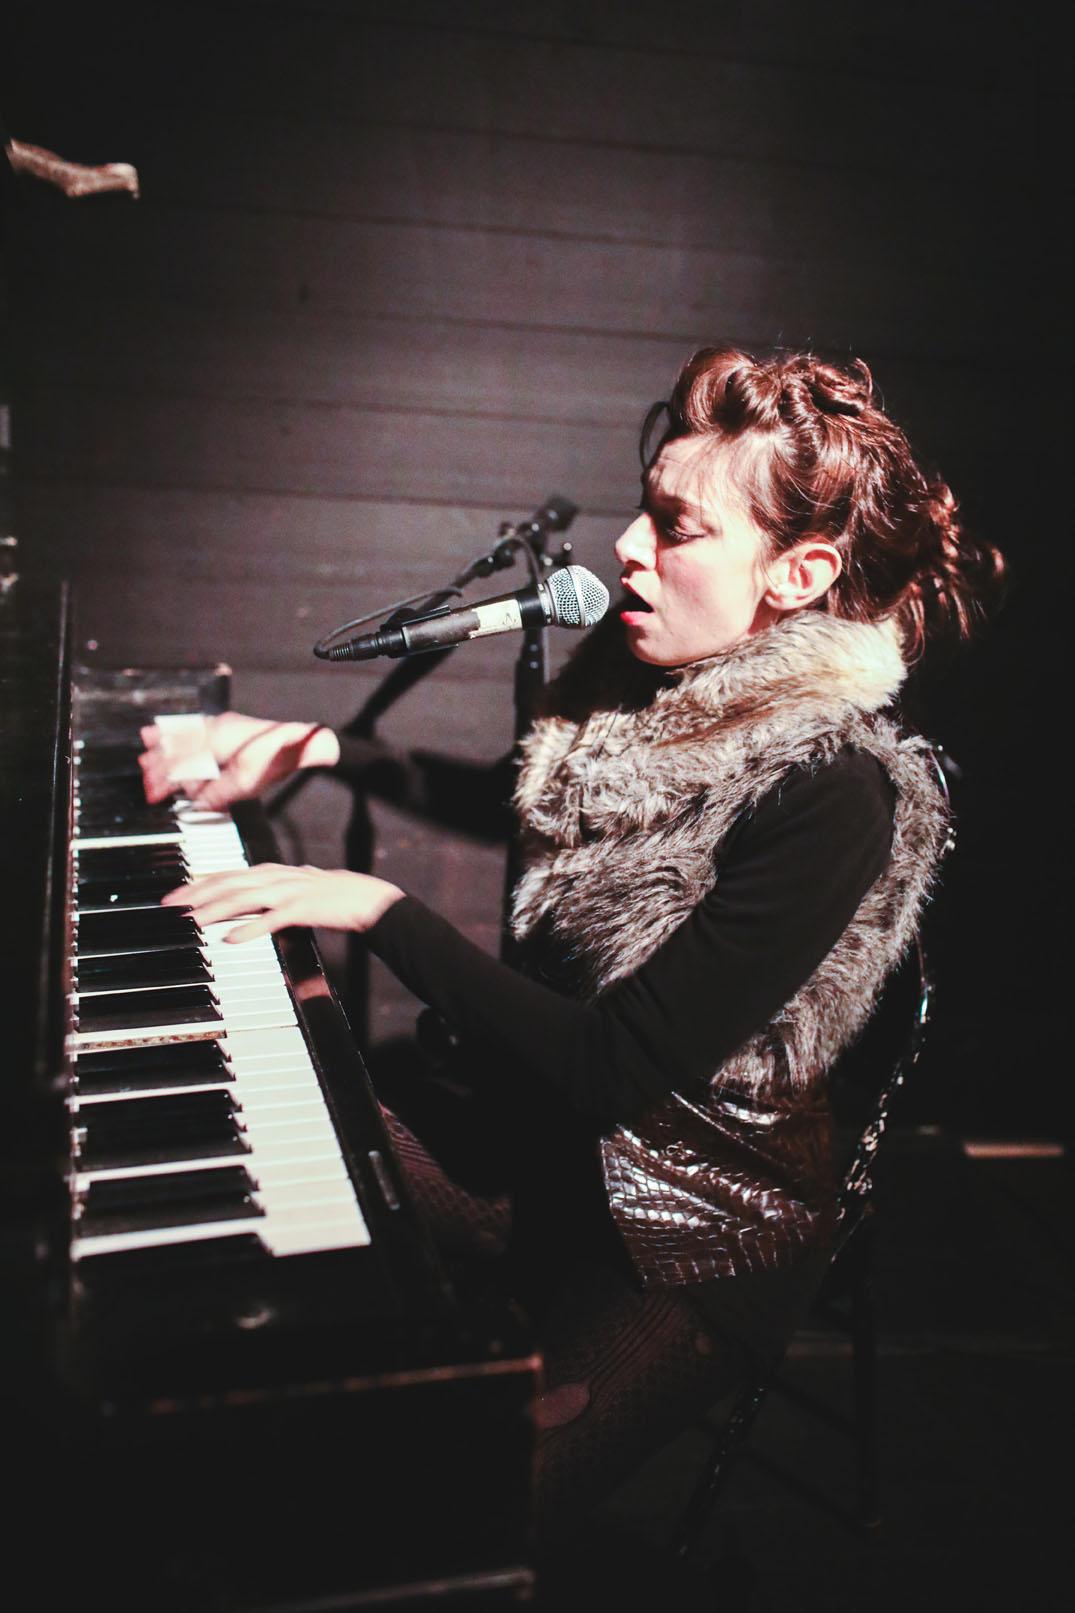 Laura aka Ludic, on piano